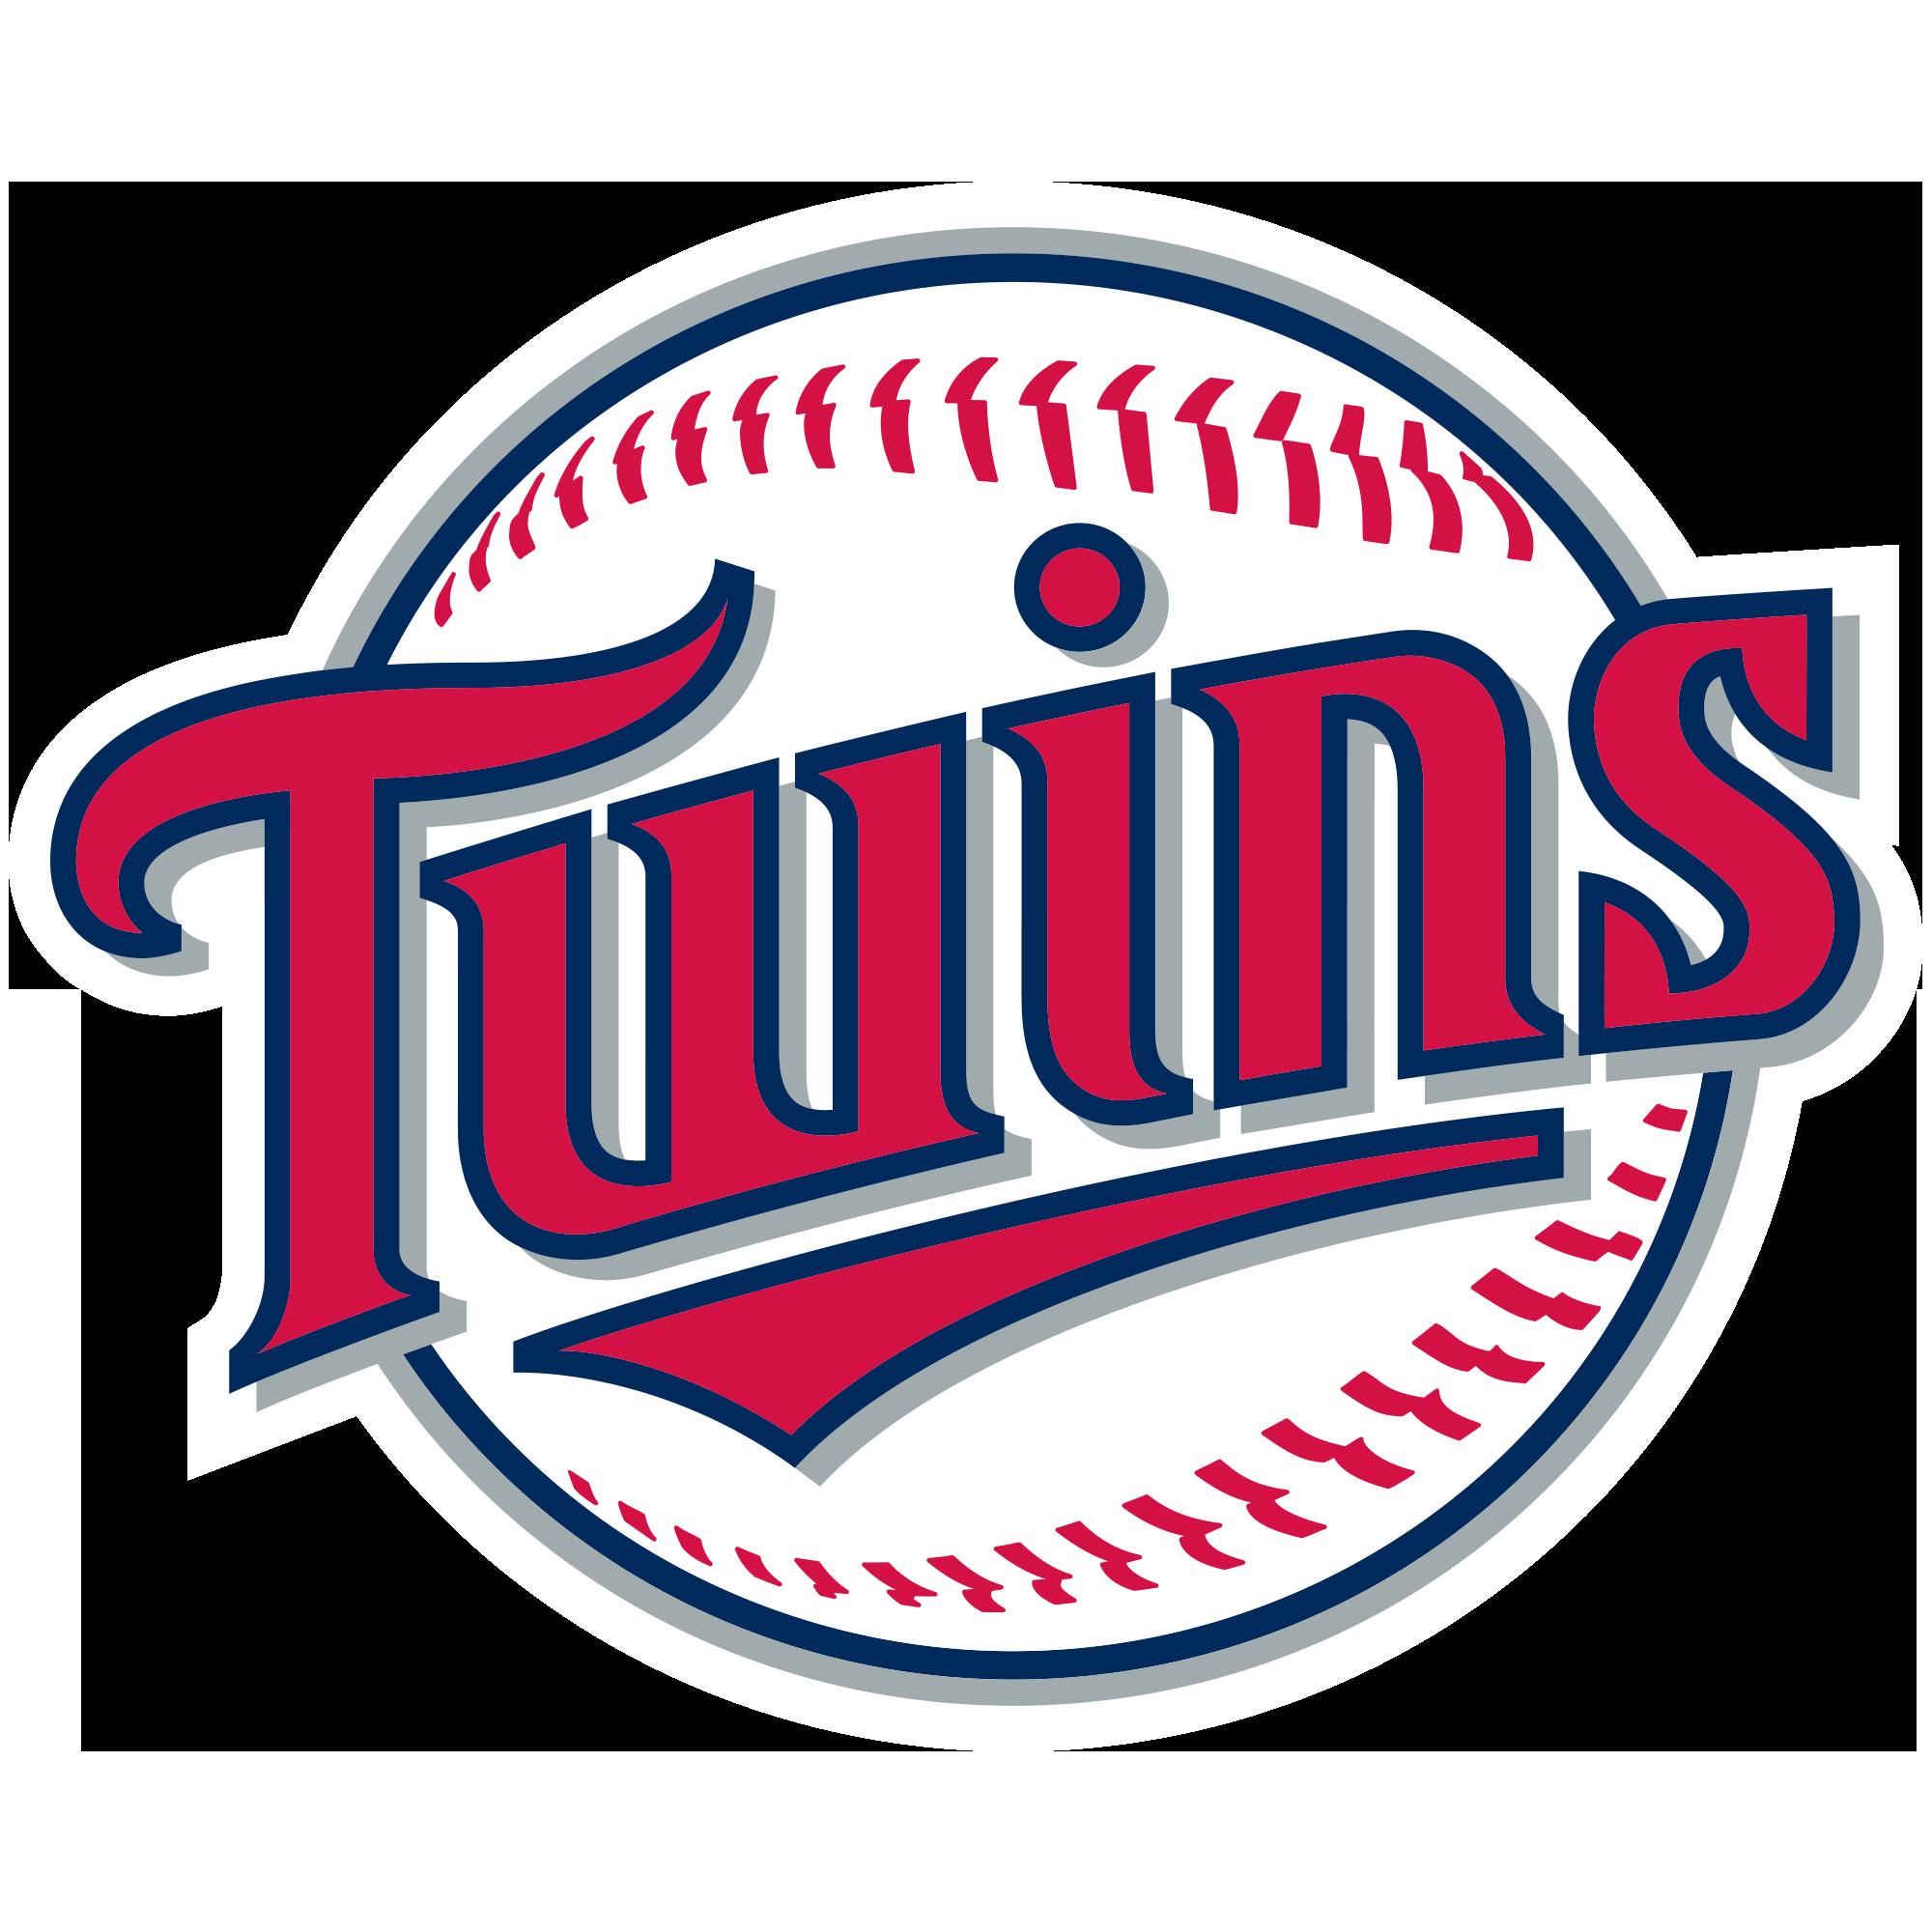 Minnesota Twins Baseball - Twins News, Scores, Stats ...